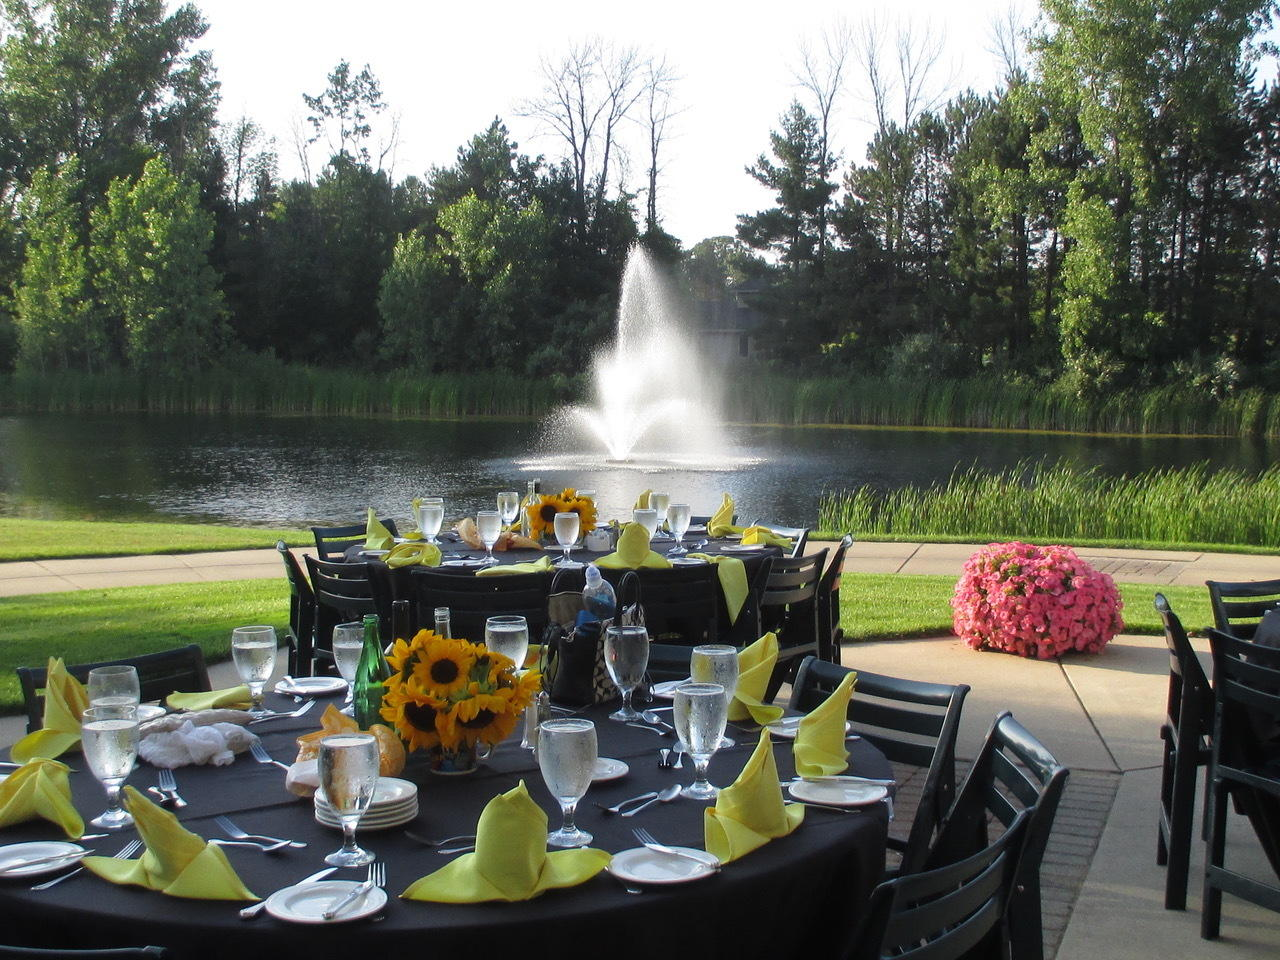 Apple Mountain Resort  Freeland MI 48623  Great Lakes